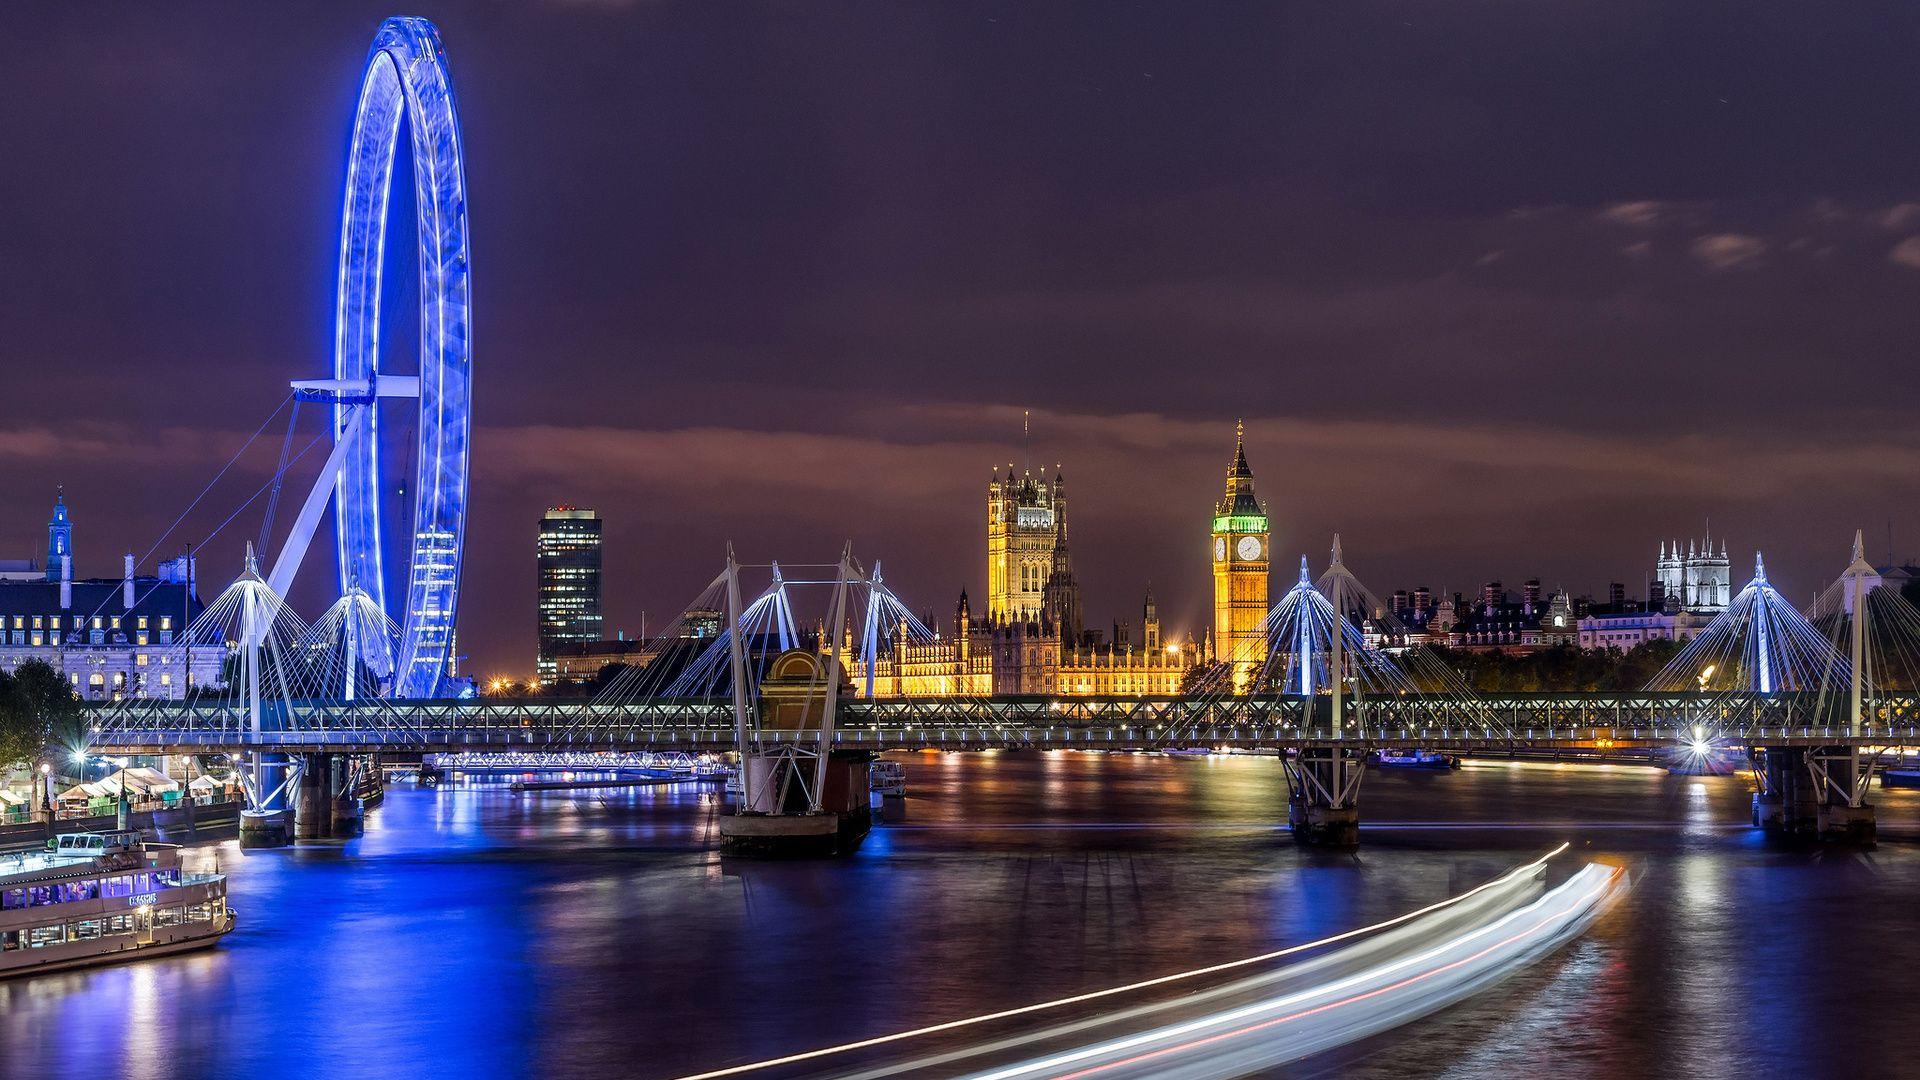 Night, Thames, London, Lights, England, River, City